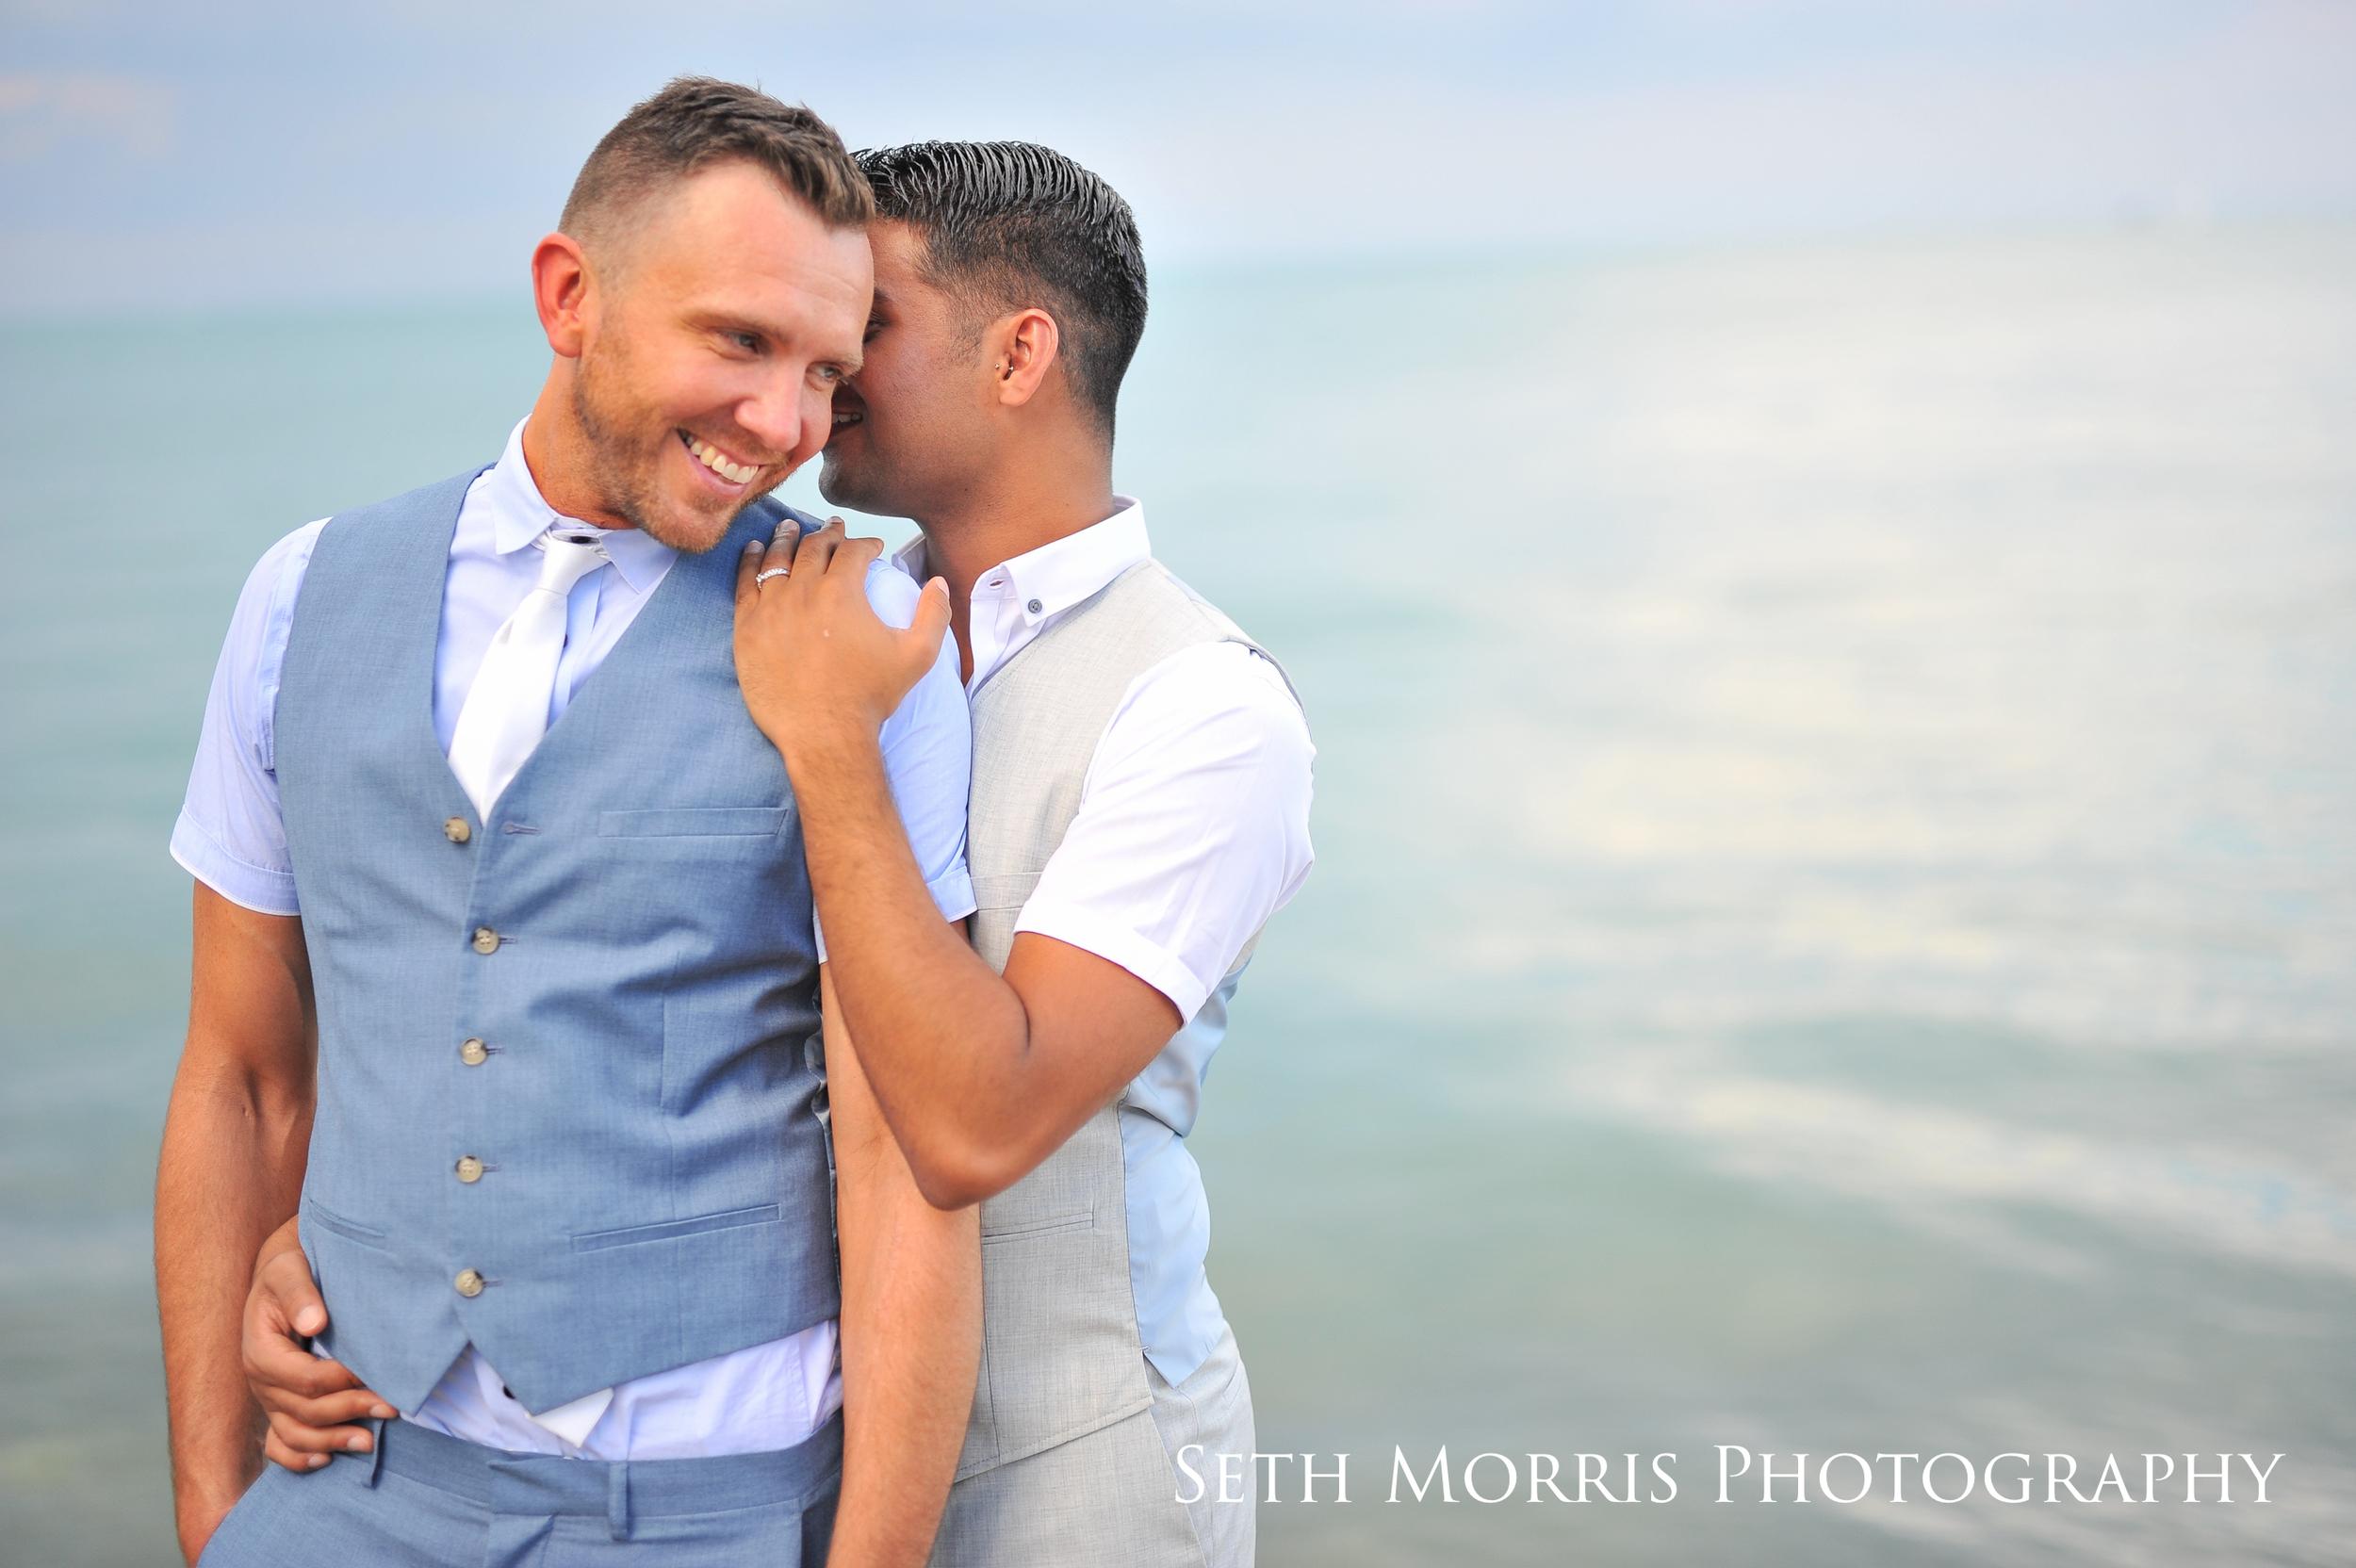 chicagoland-engagement-photographer-same-sex-wedding-4.JPG